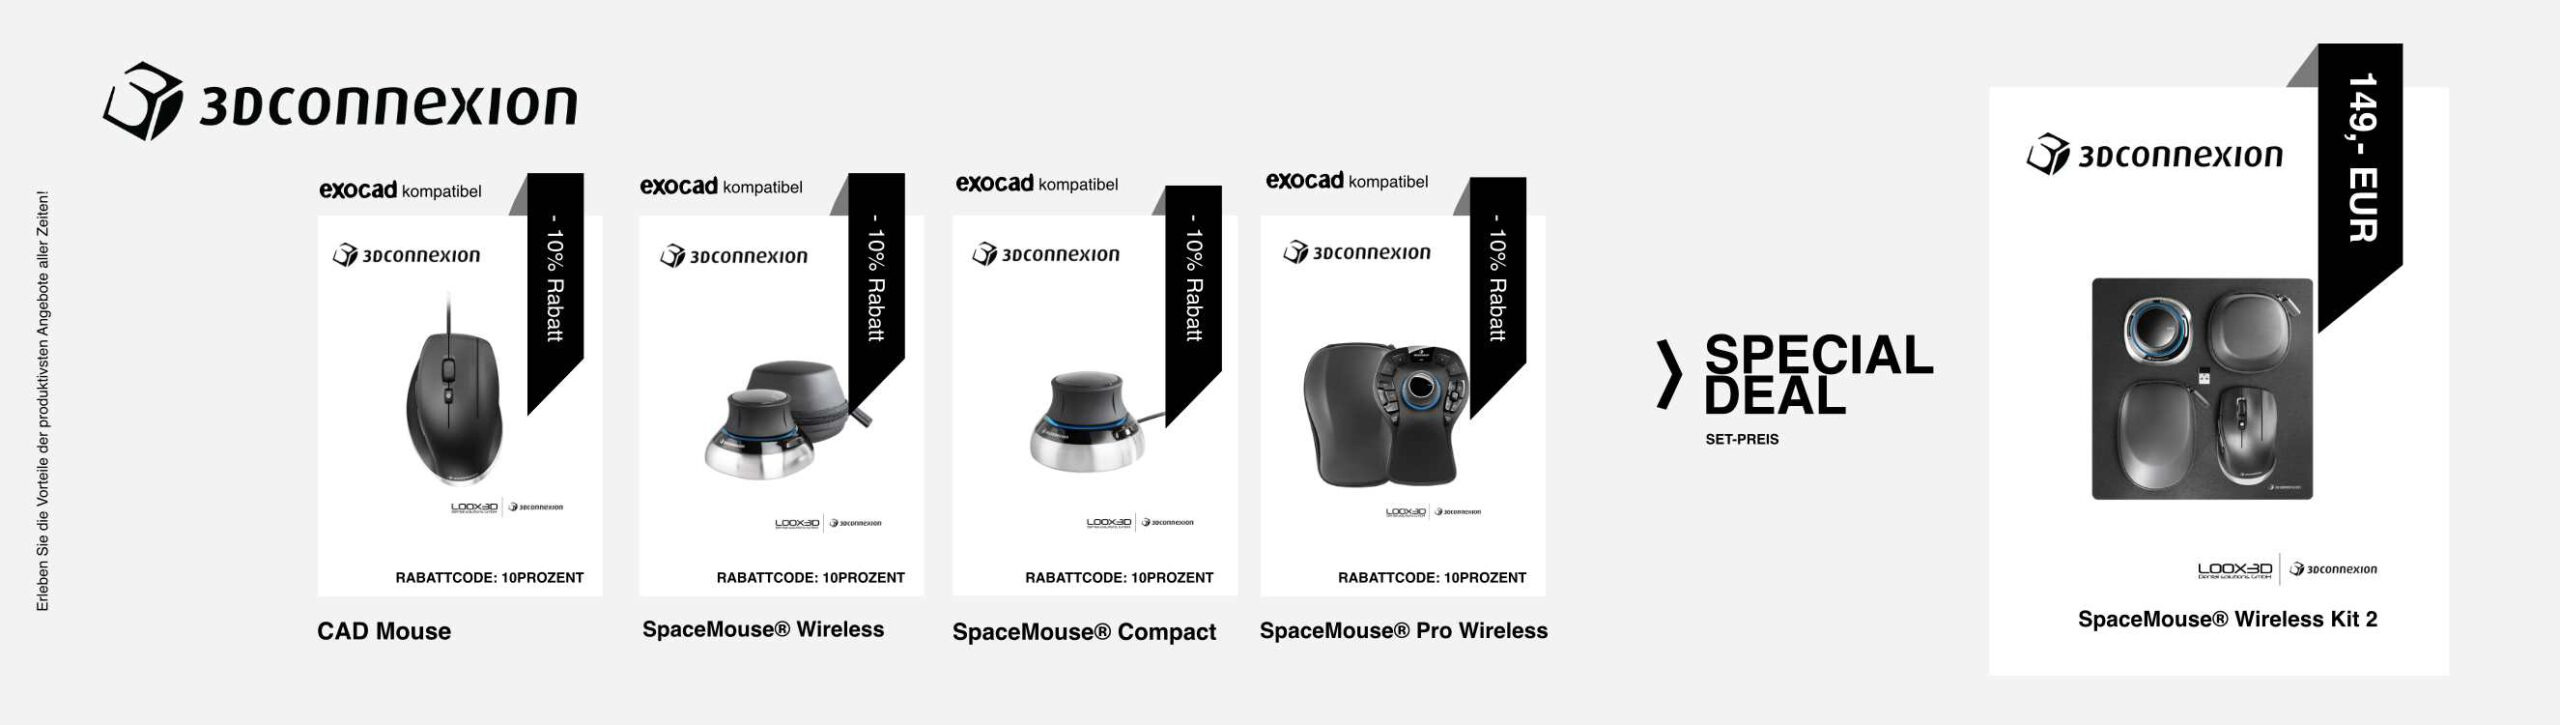 3DConnexion Angebote